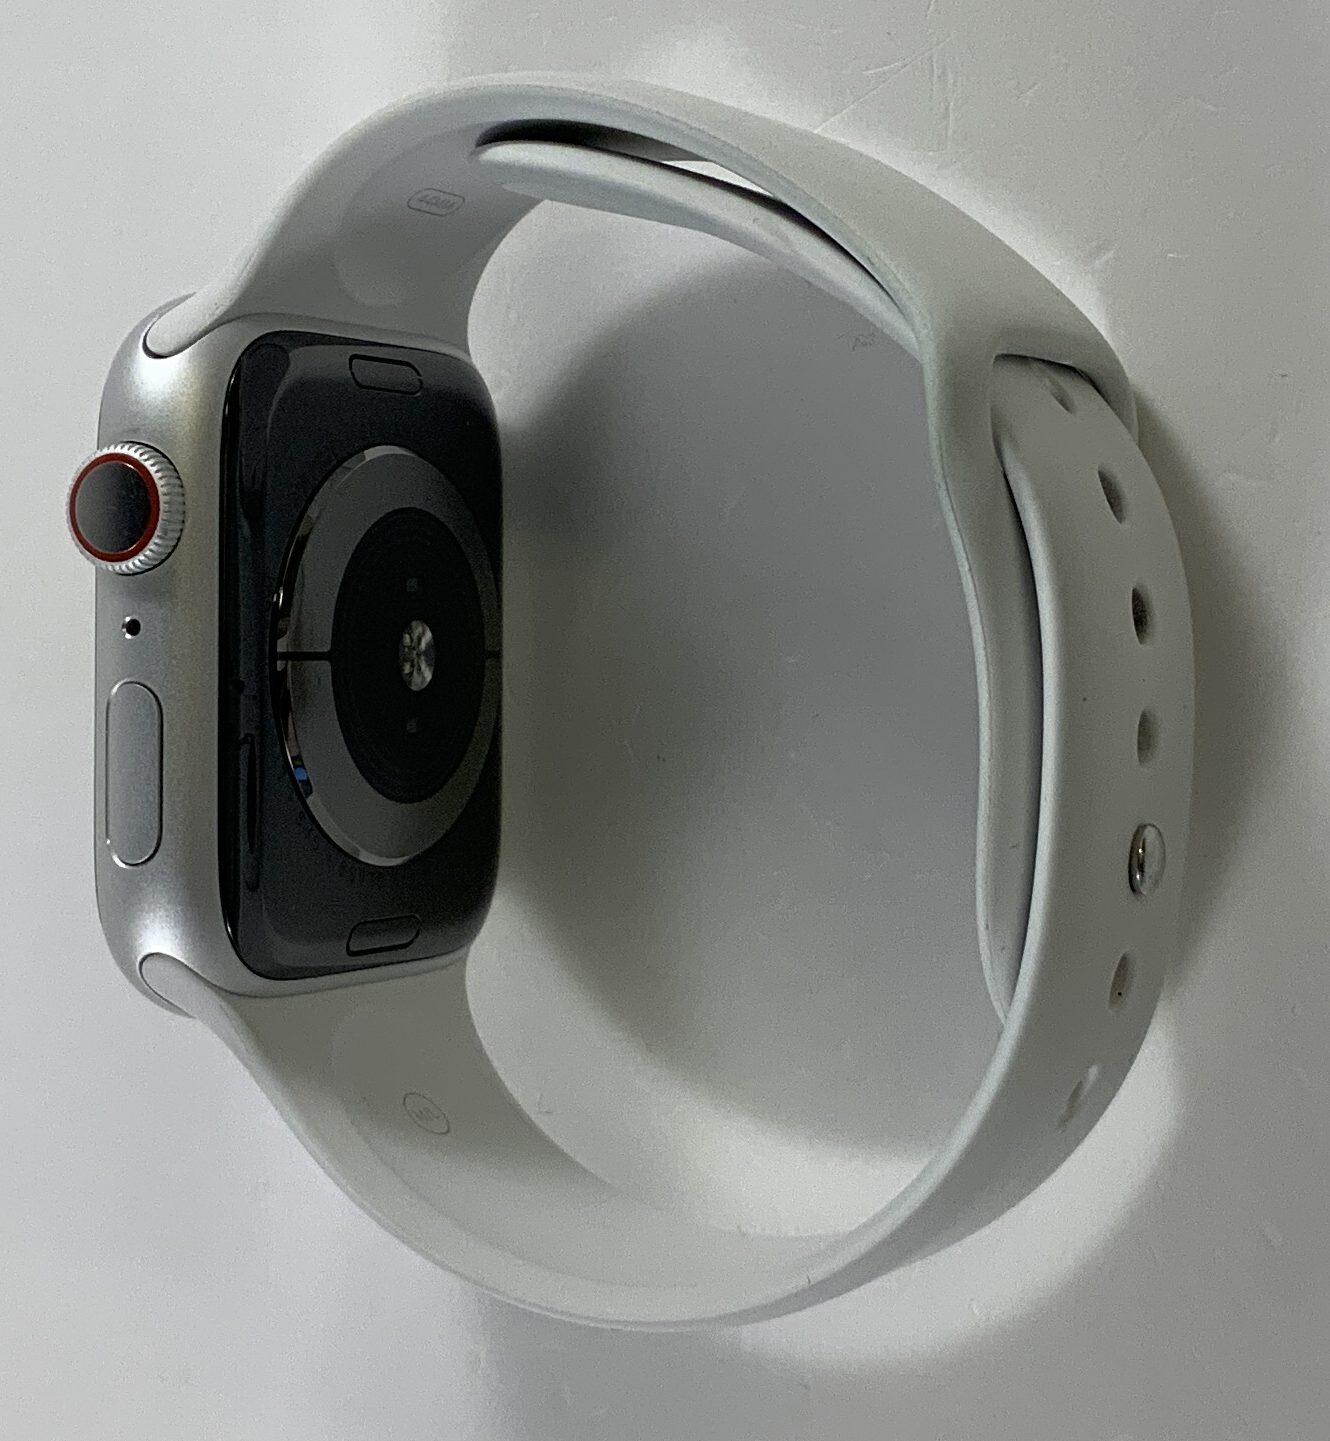 Watch Series 5 Aluminum Cellular (44mm), Silver, Kuva 3